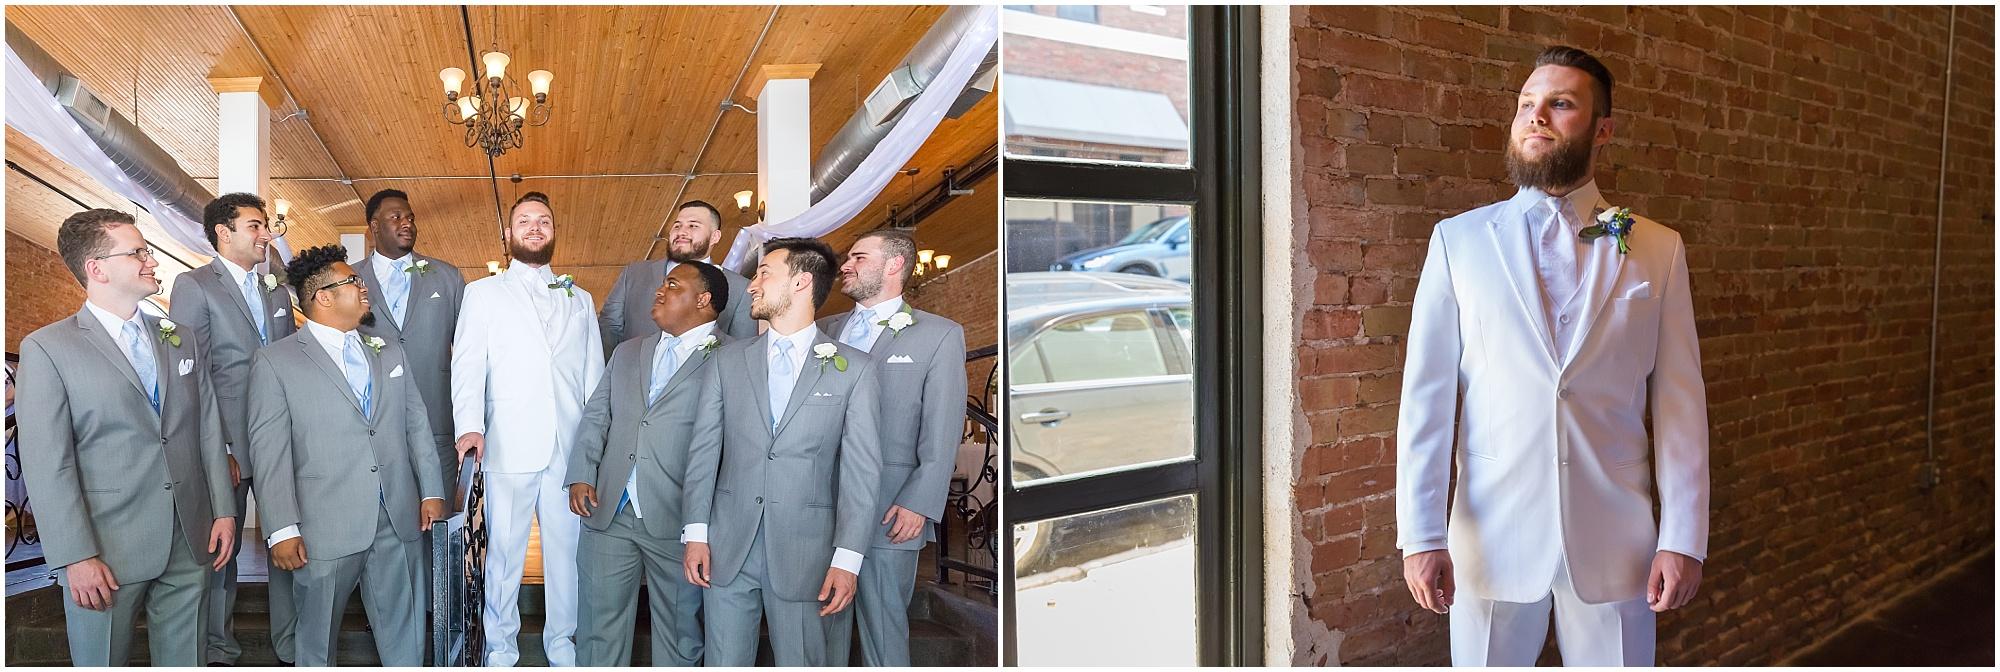 Groom and his groomsmen in downtown Waco - www.jasonandmelaina.com